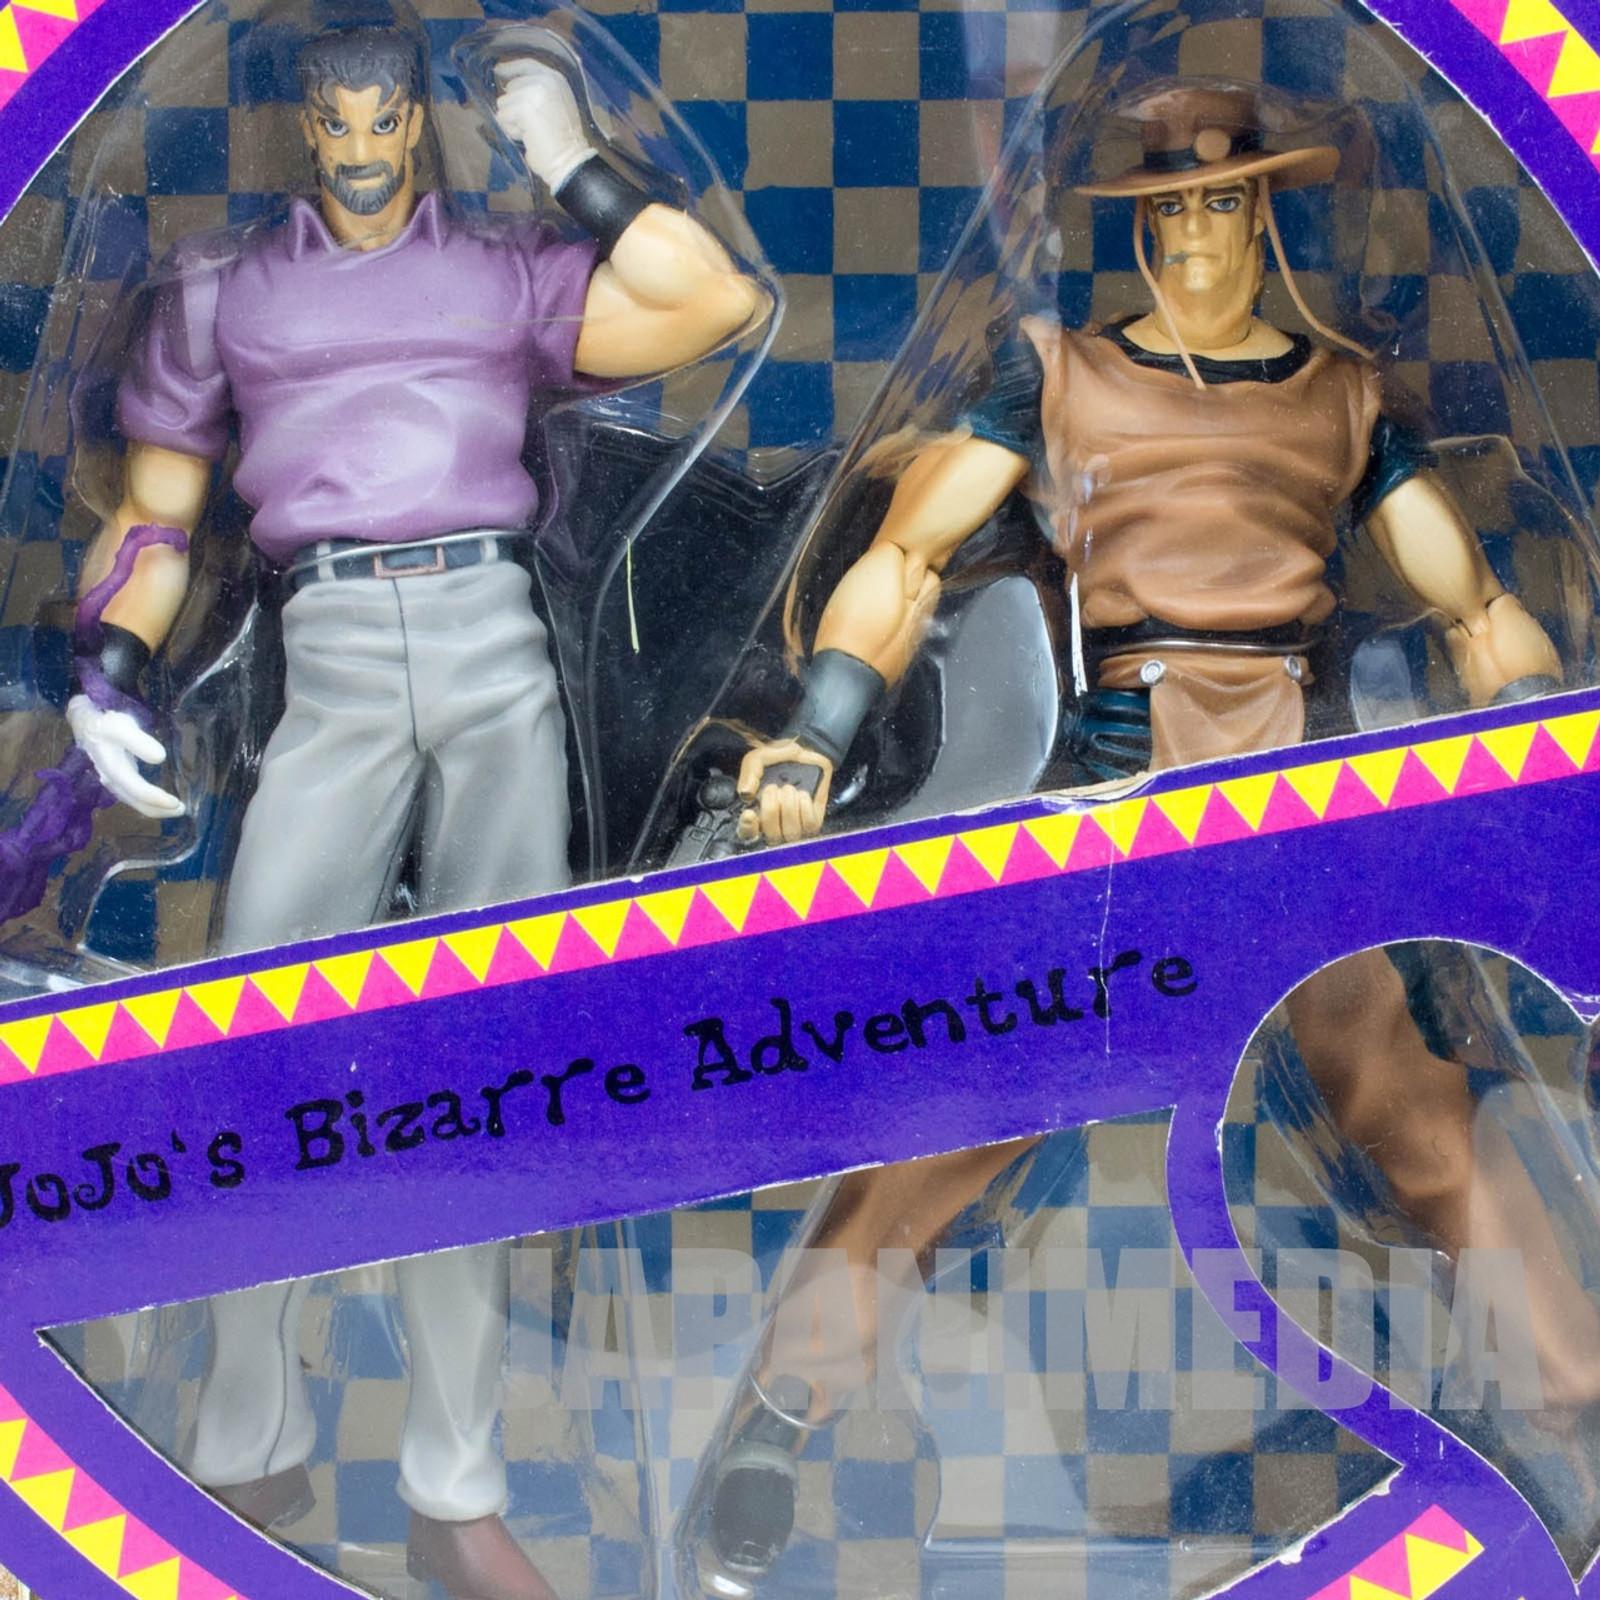 Jojo's Bizarre Adventure Joseph Joestar & Hol Horse Figure ARTFX JAPAN